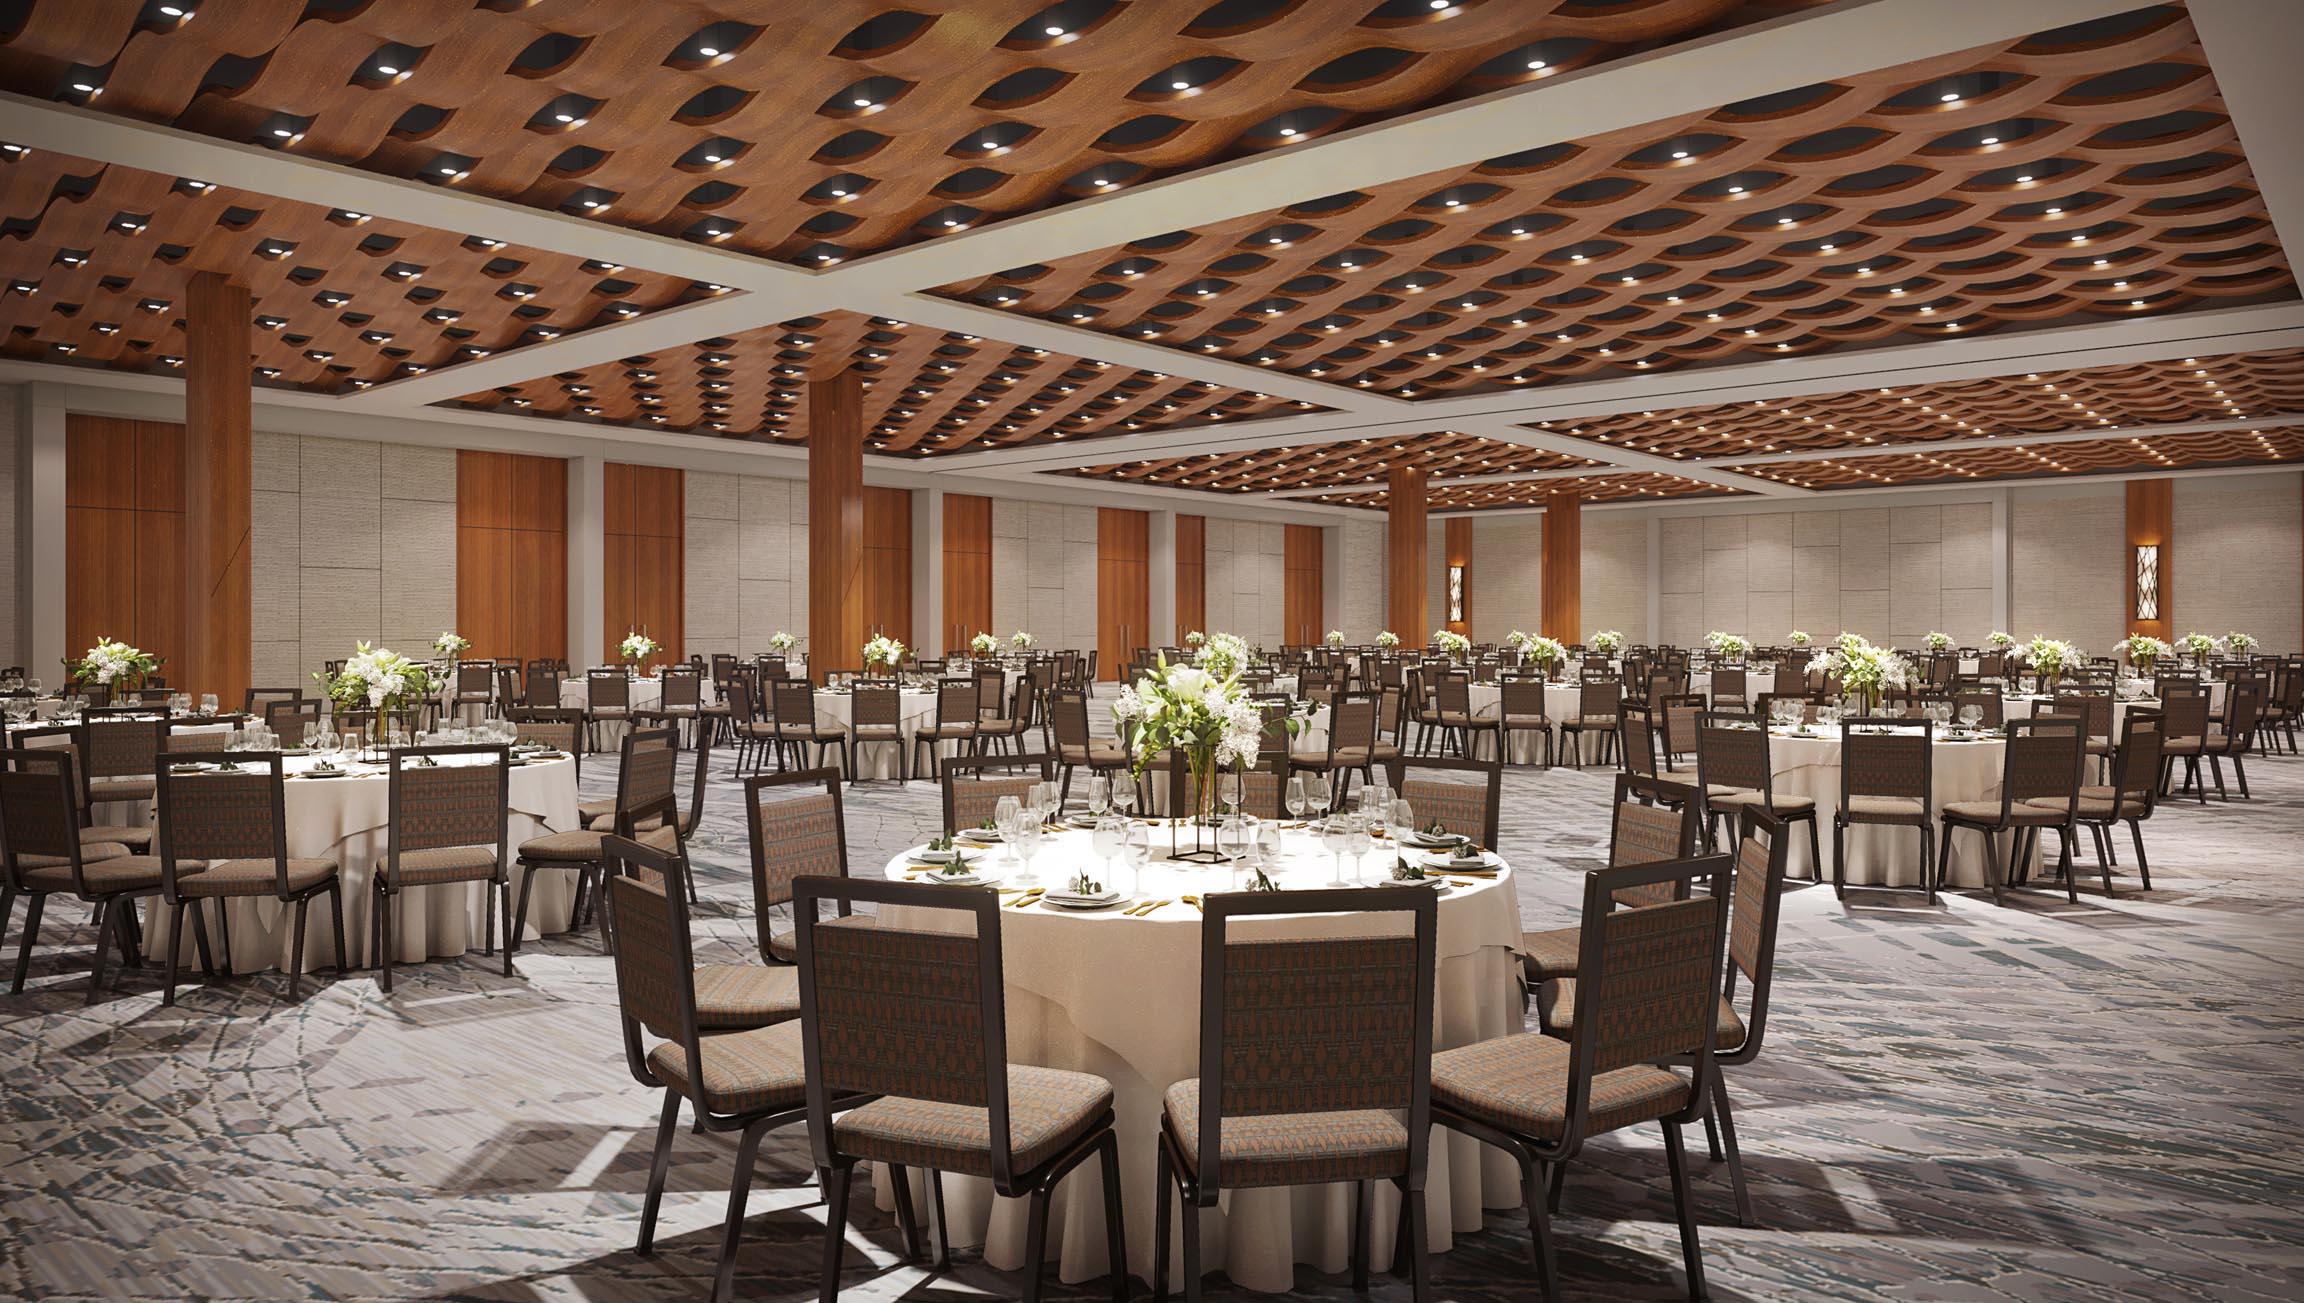 Alohilani Resort Waikiki Beach Meeting Rooms, Prefunction, and Ballroom - Interior Design